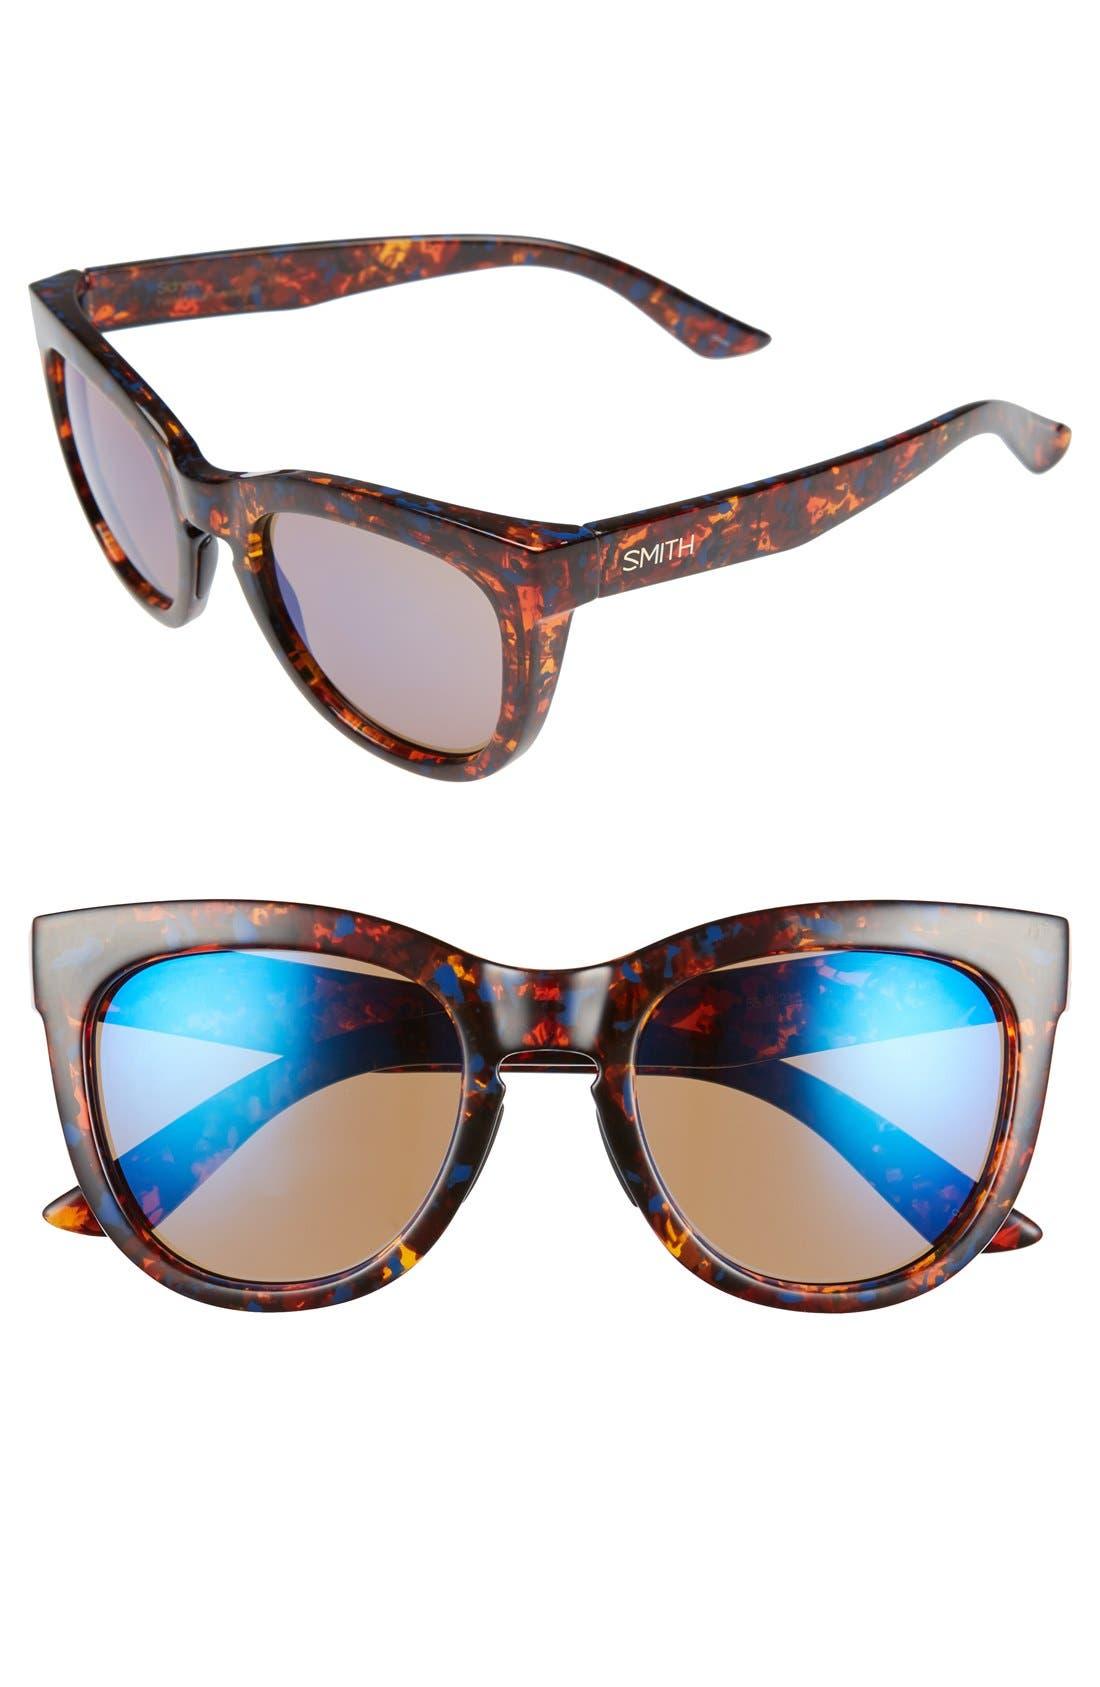 SMITH Sidney 52mm Sunglasses